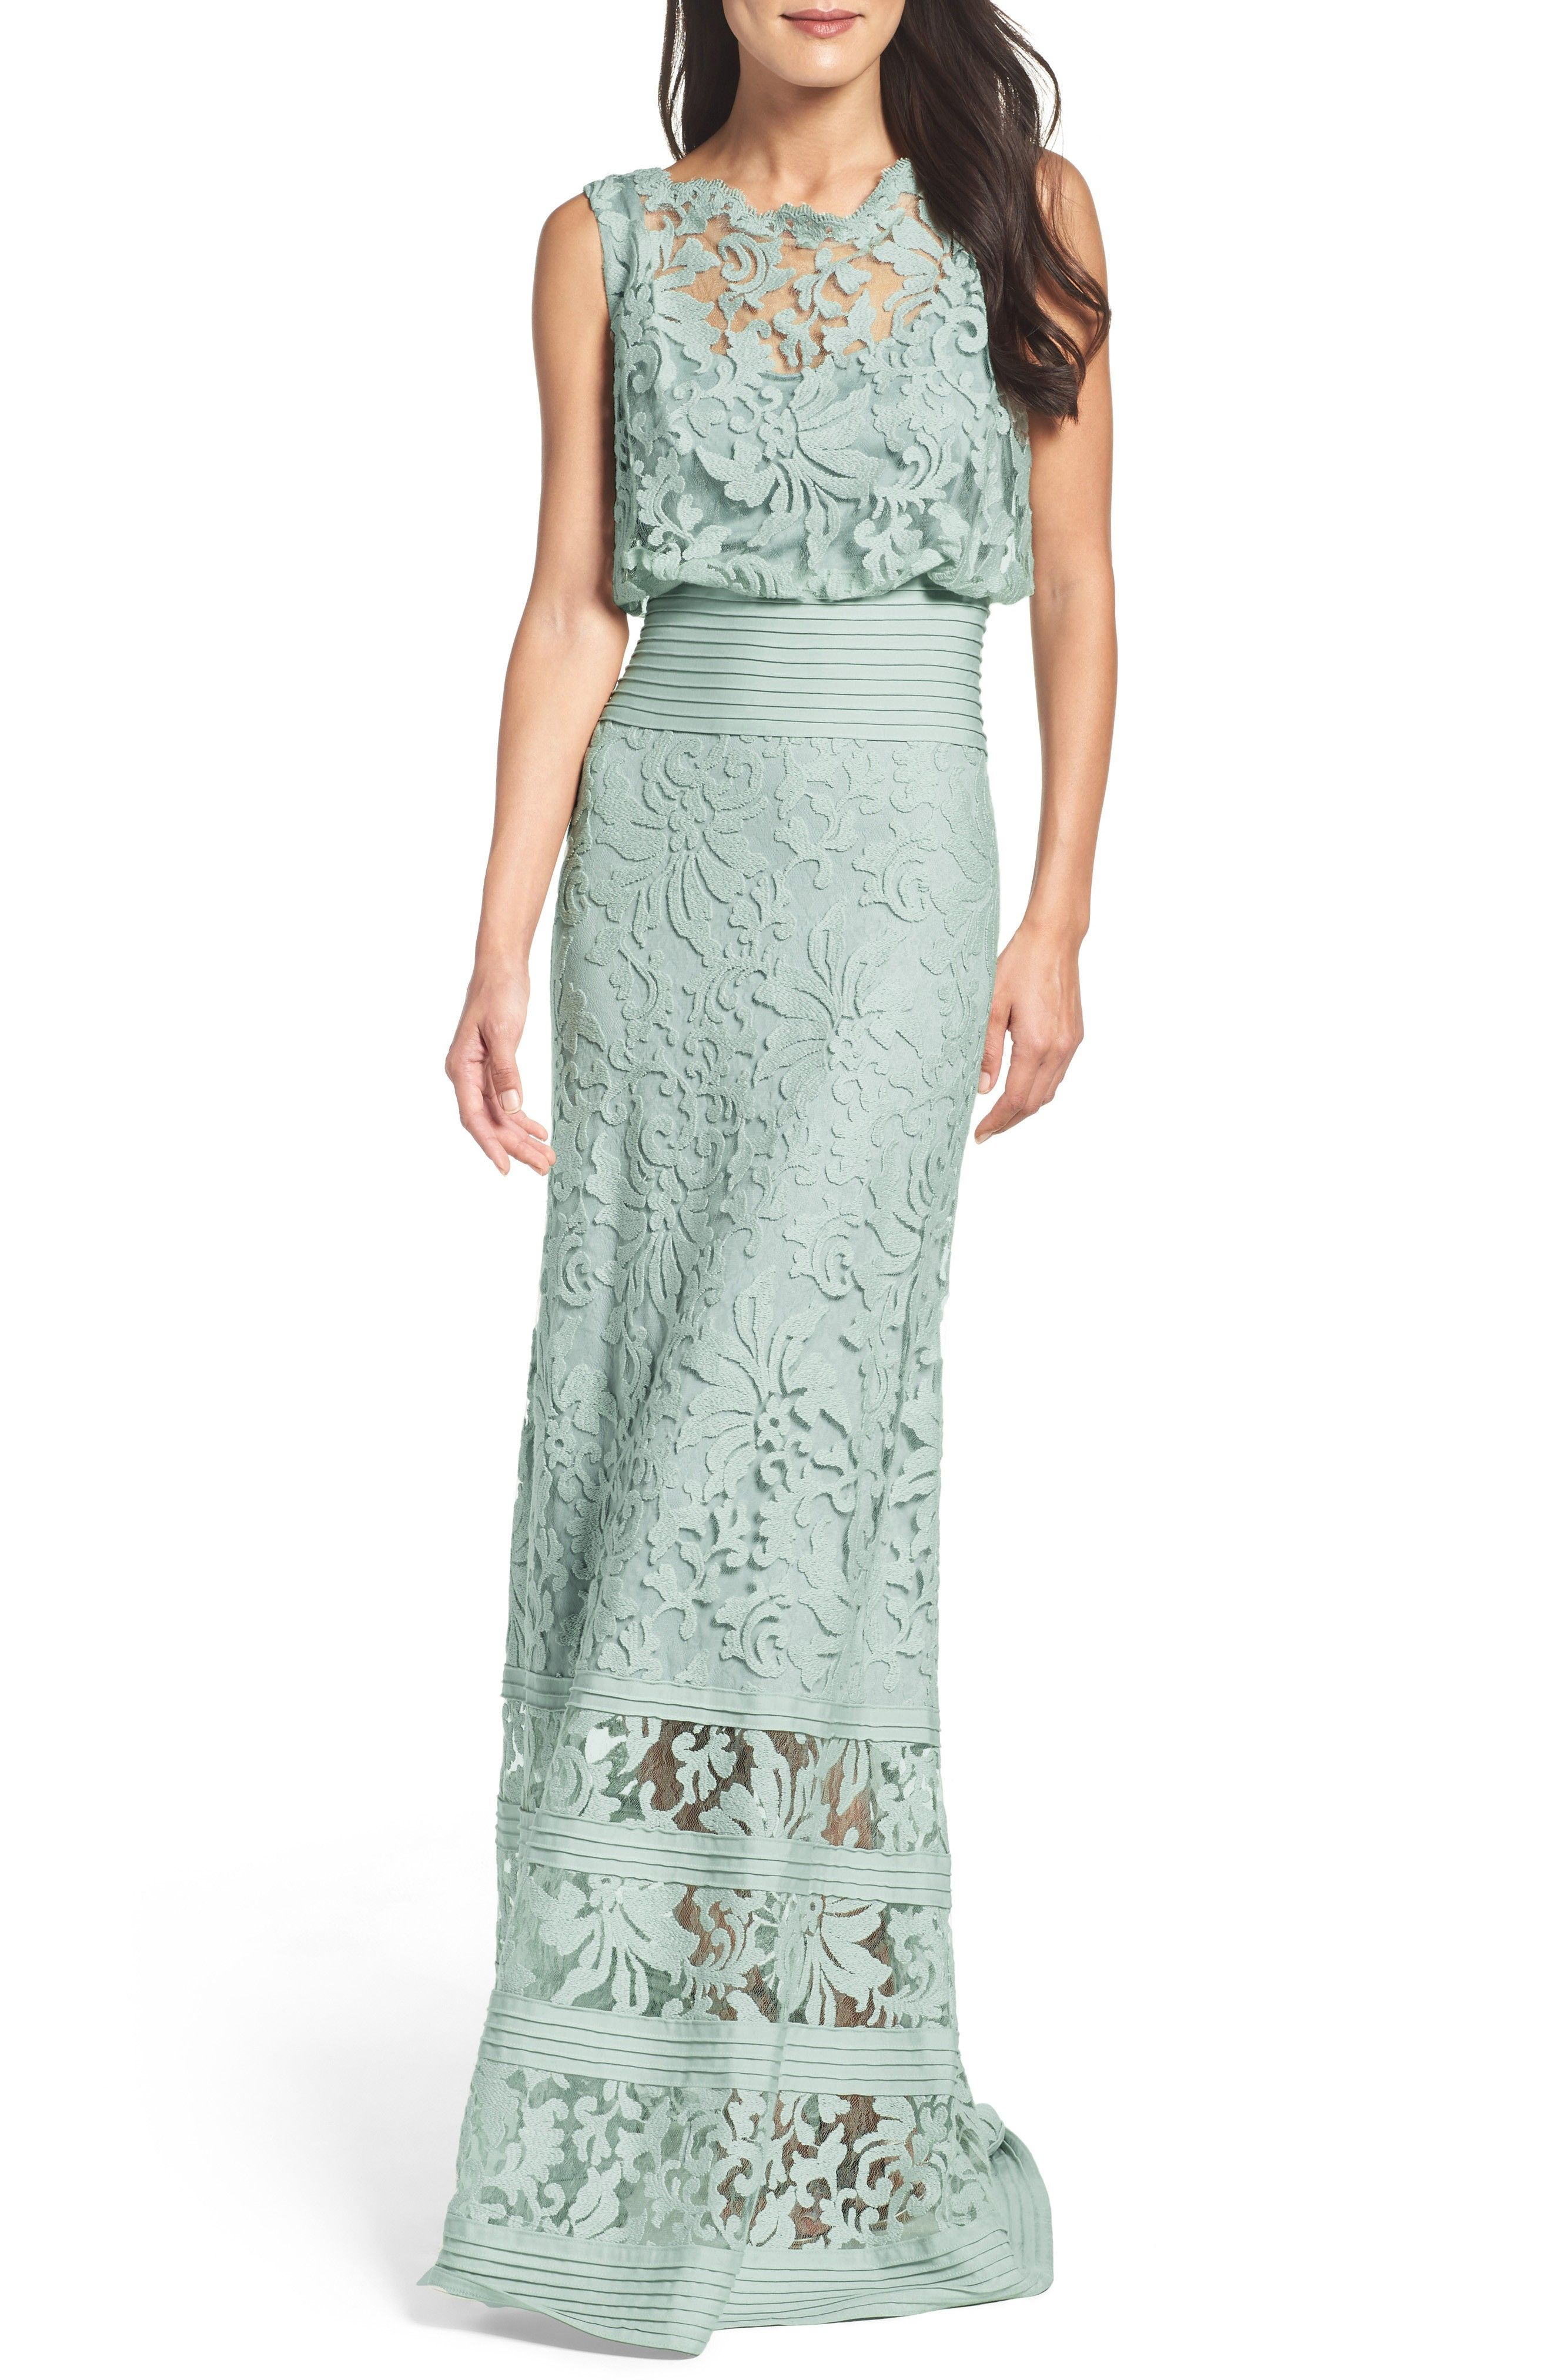 Luxury Vestir A Novios Pictures - All Wedding Dresses ...